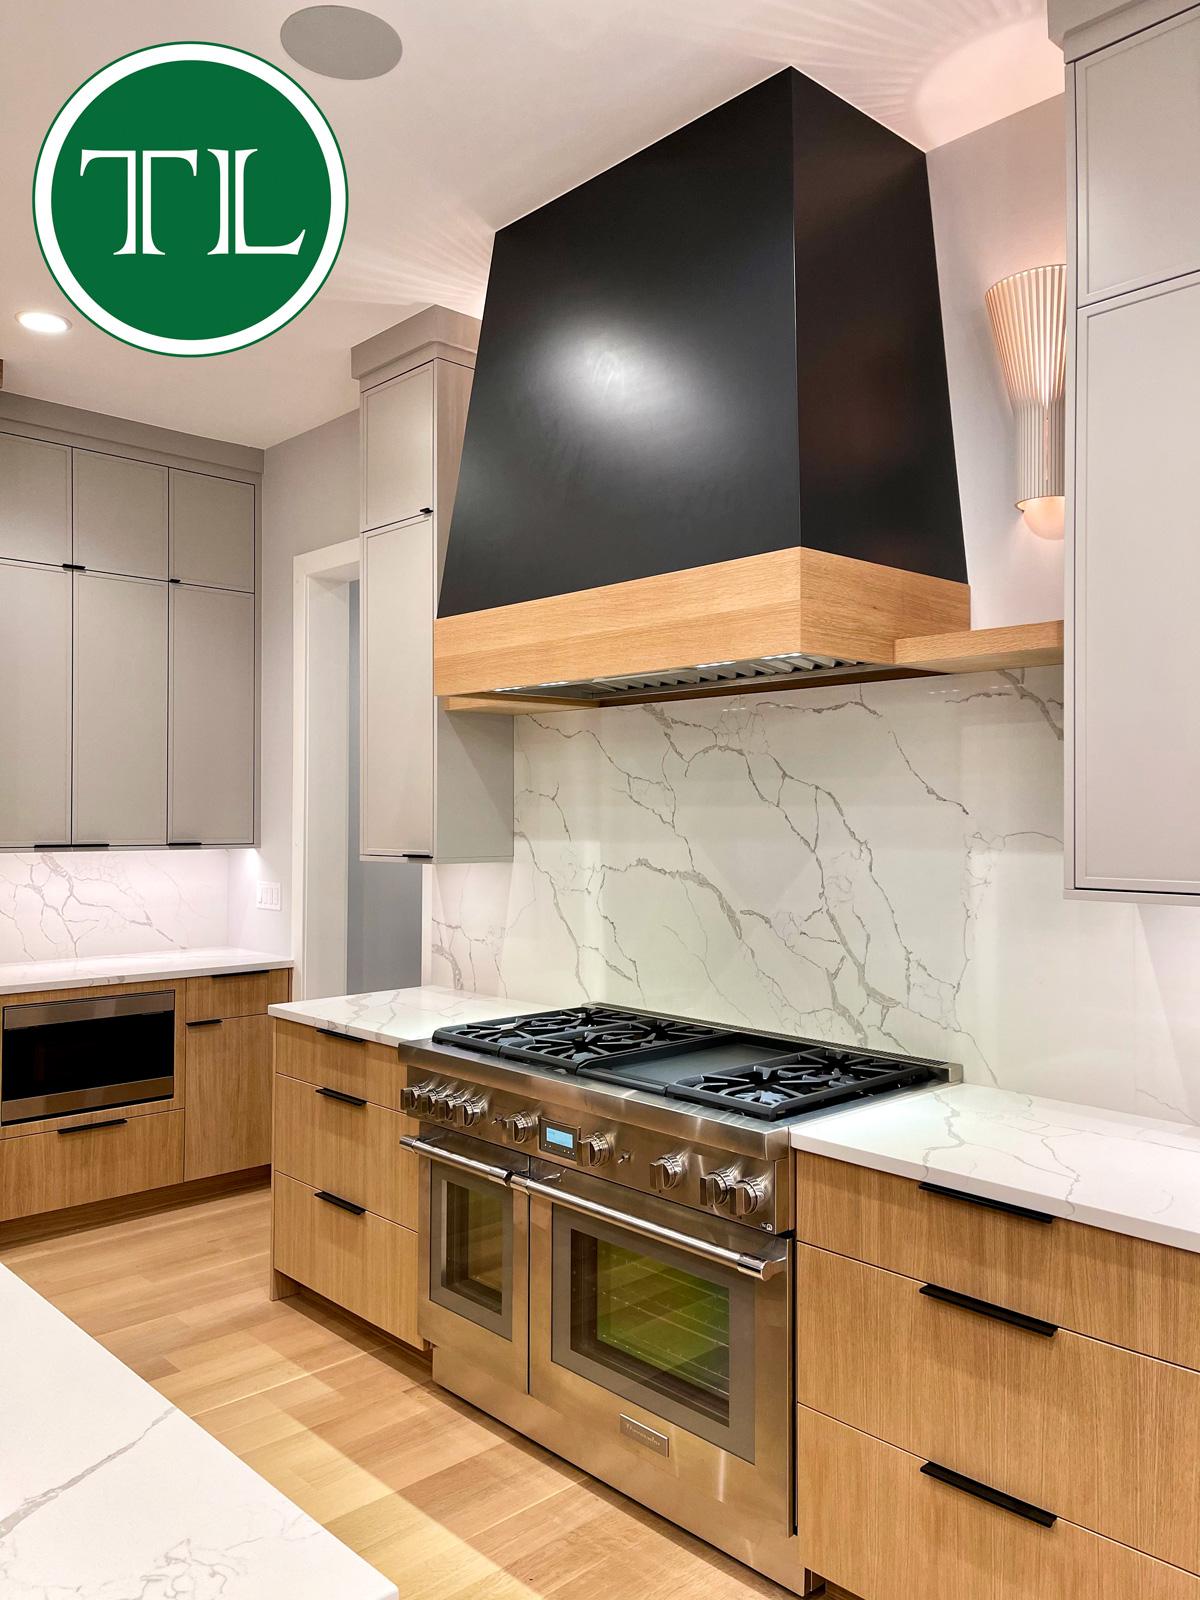 Tom Len Custom Homes - North Shore Custom Home Builders -Peach Tree Home 2021